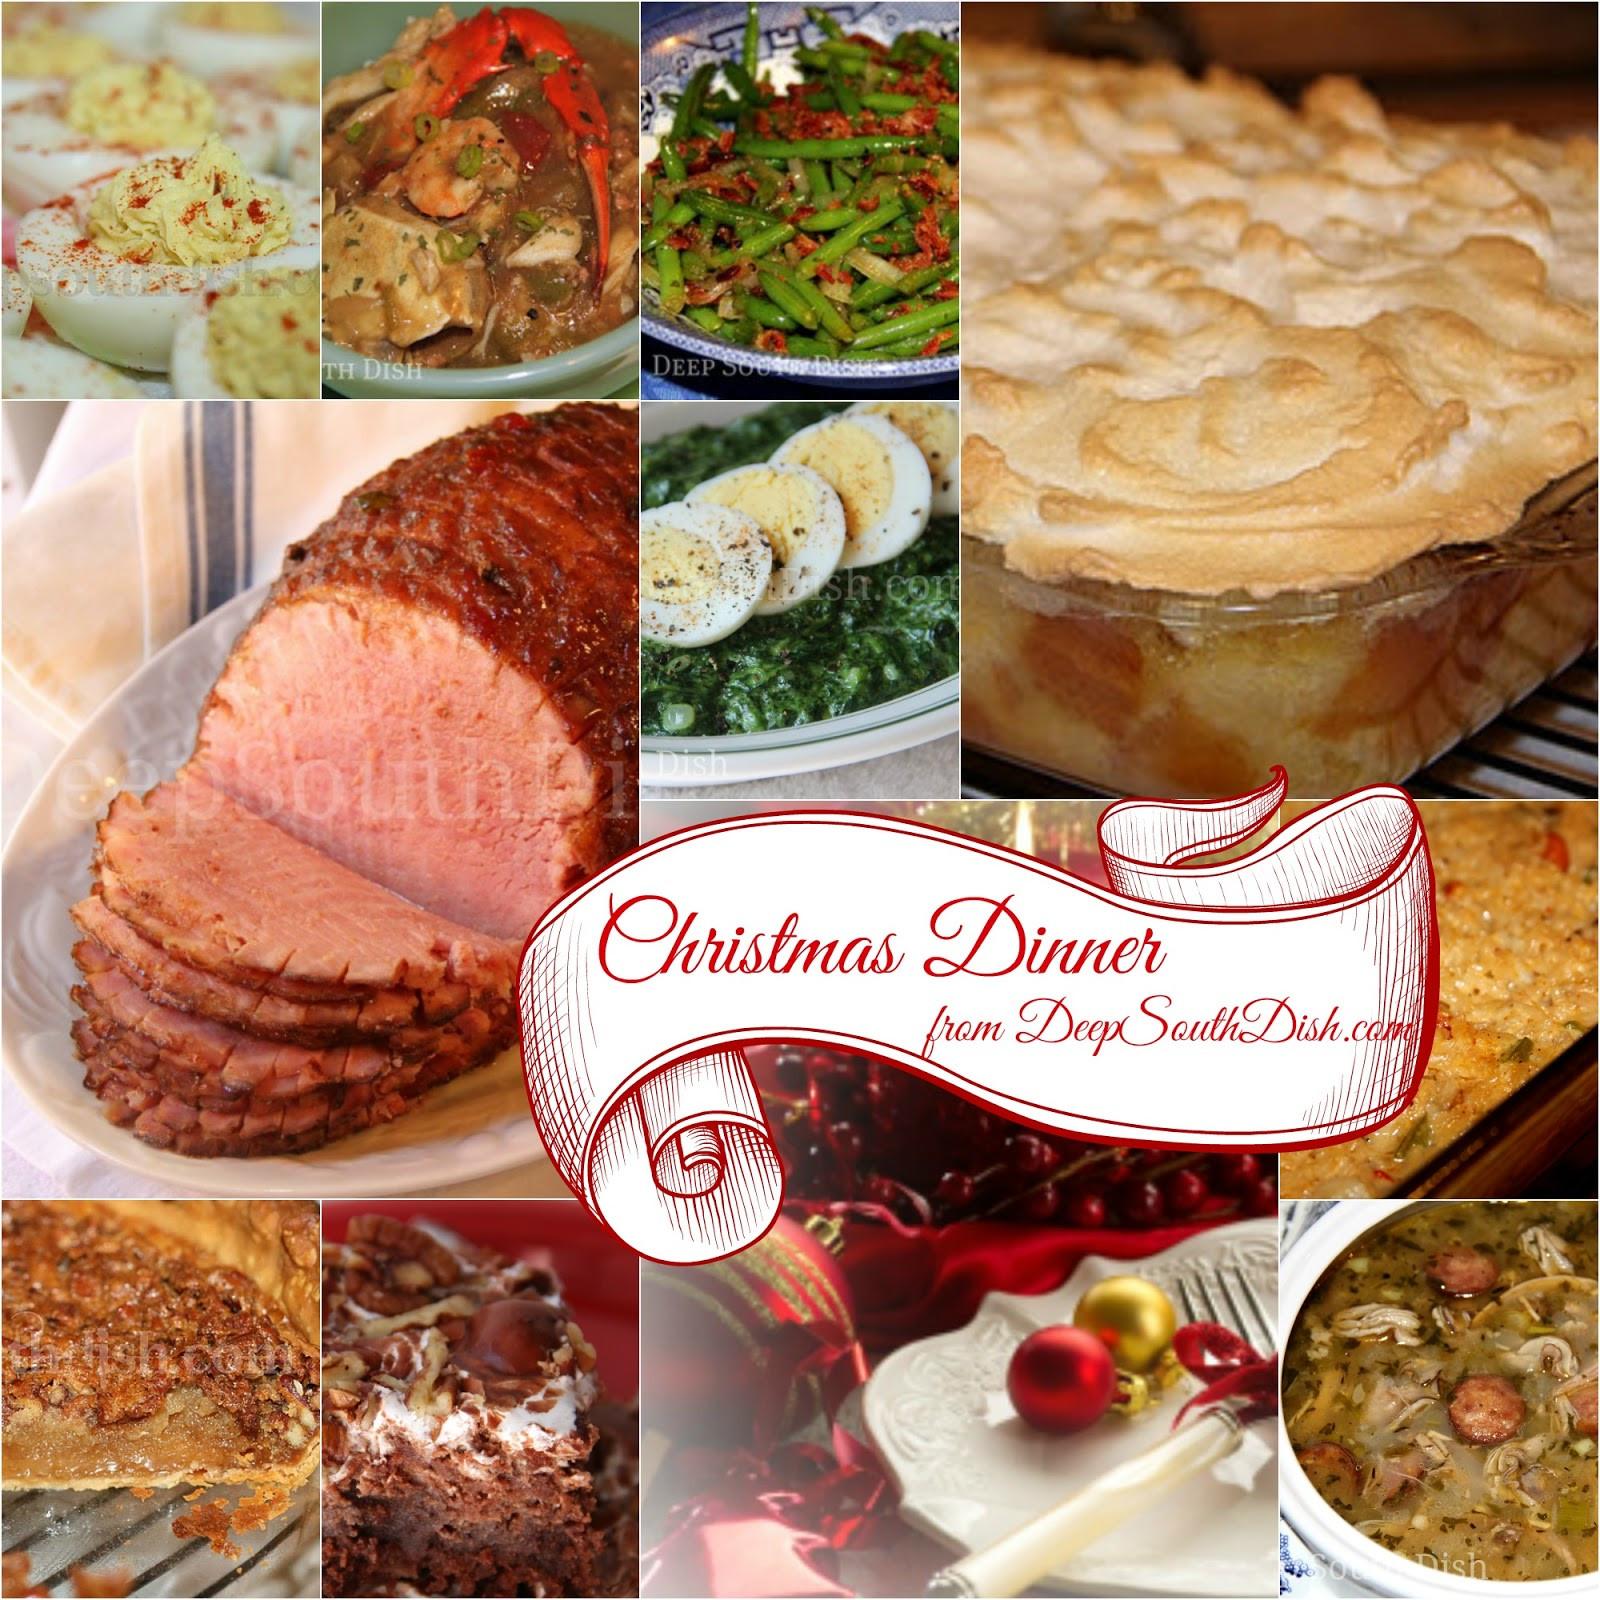 Southern Christmas Dinner Menu Ideas  Deep South Dish Southern Christmas Dinner Menu and Recipe